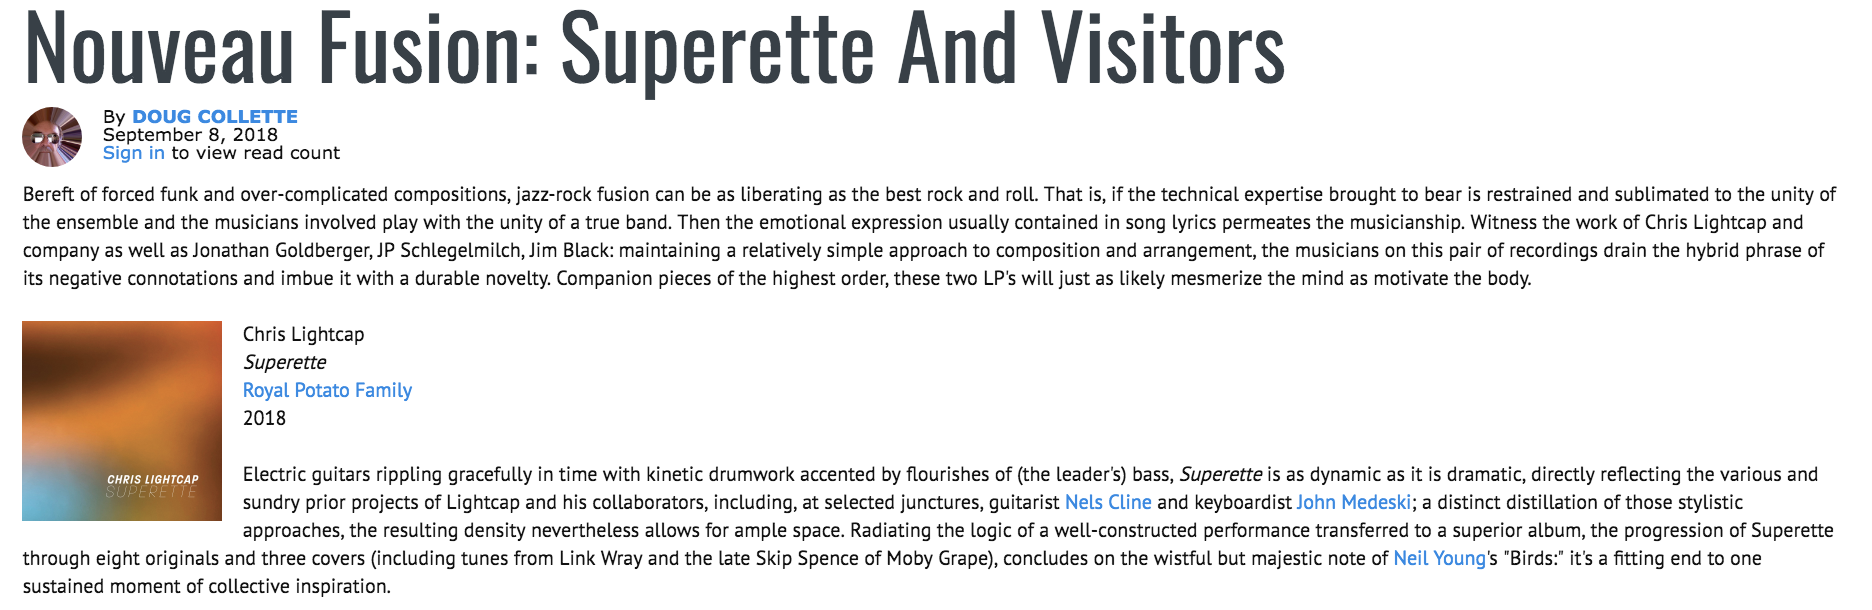 Press_AAJ_Superette2018.png